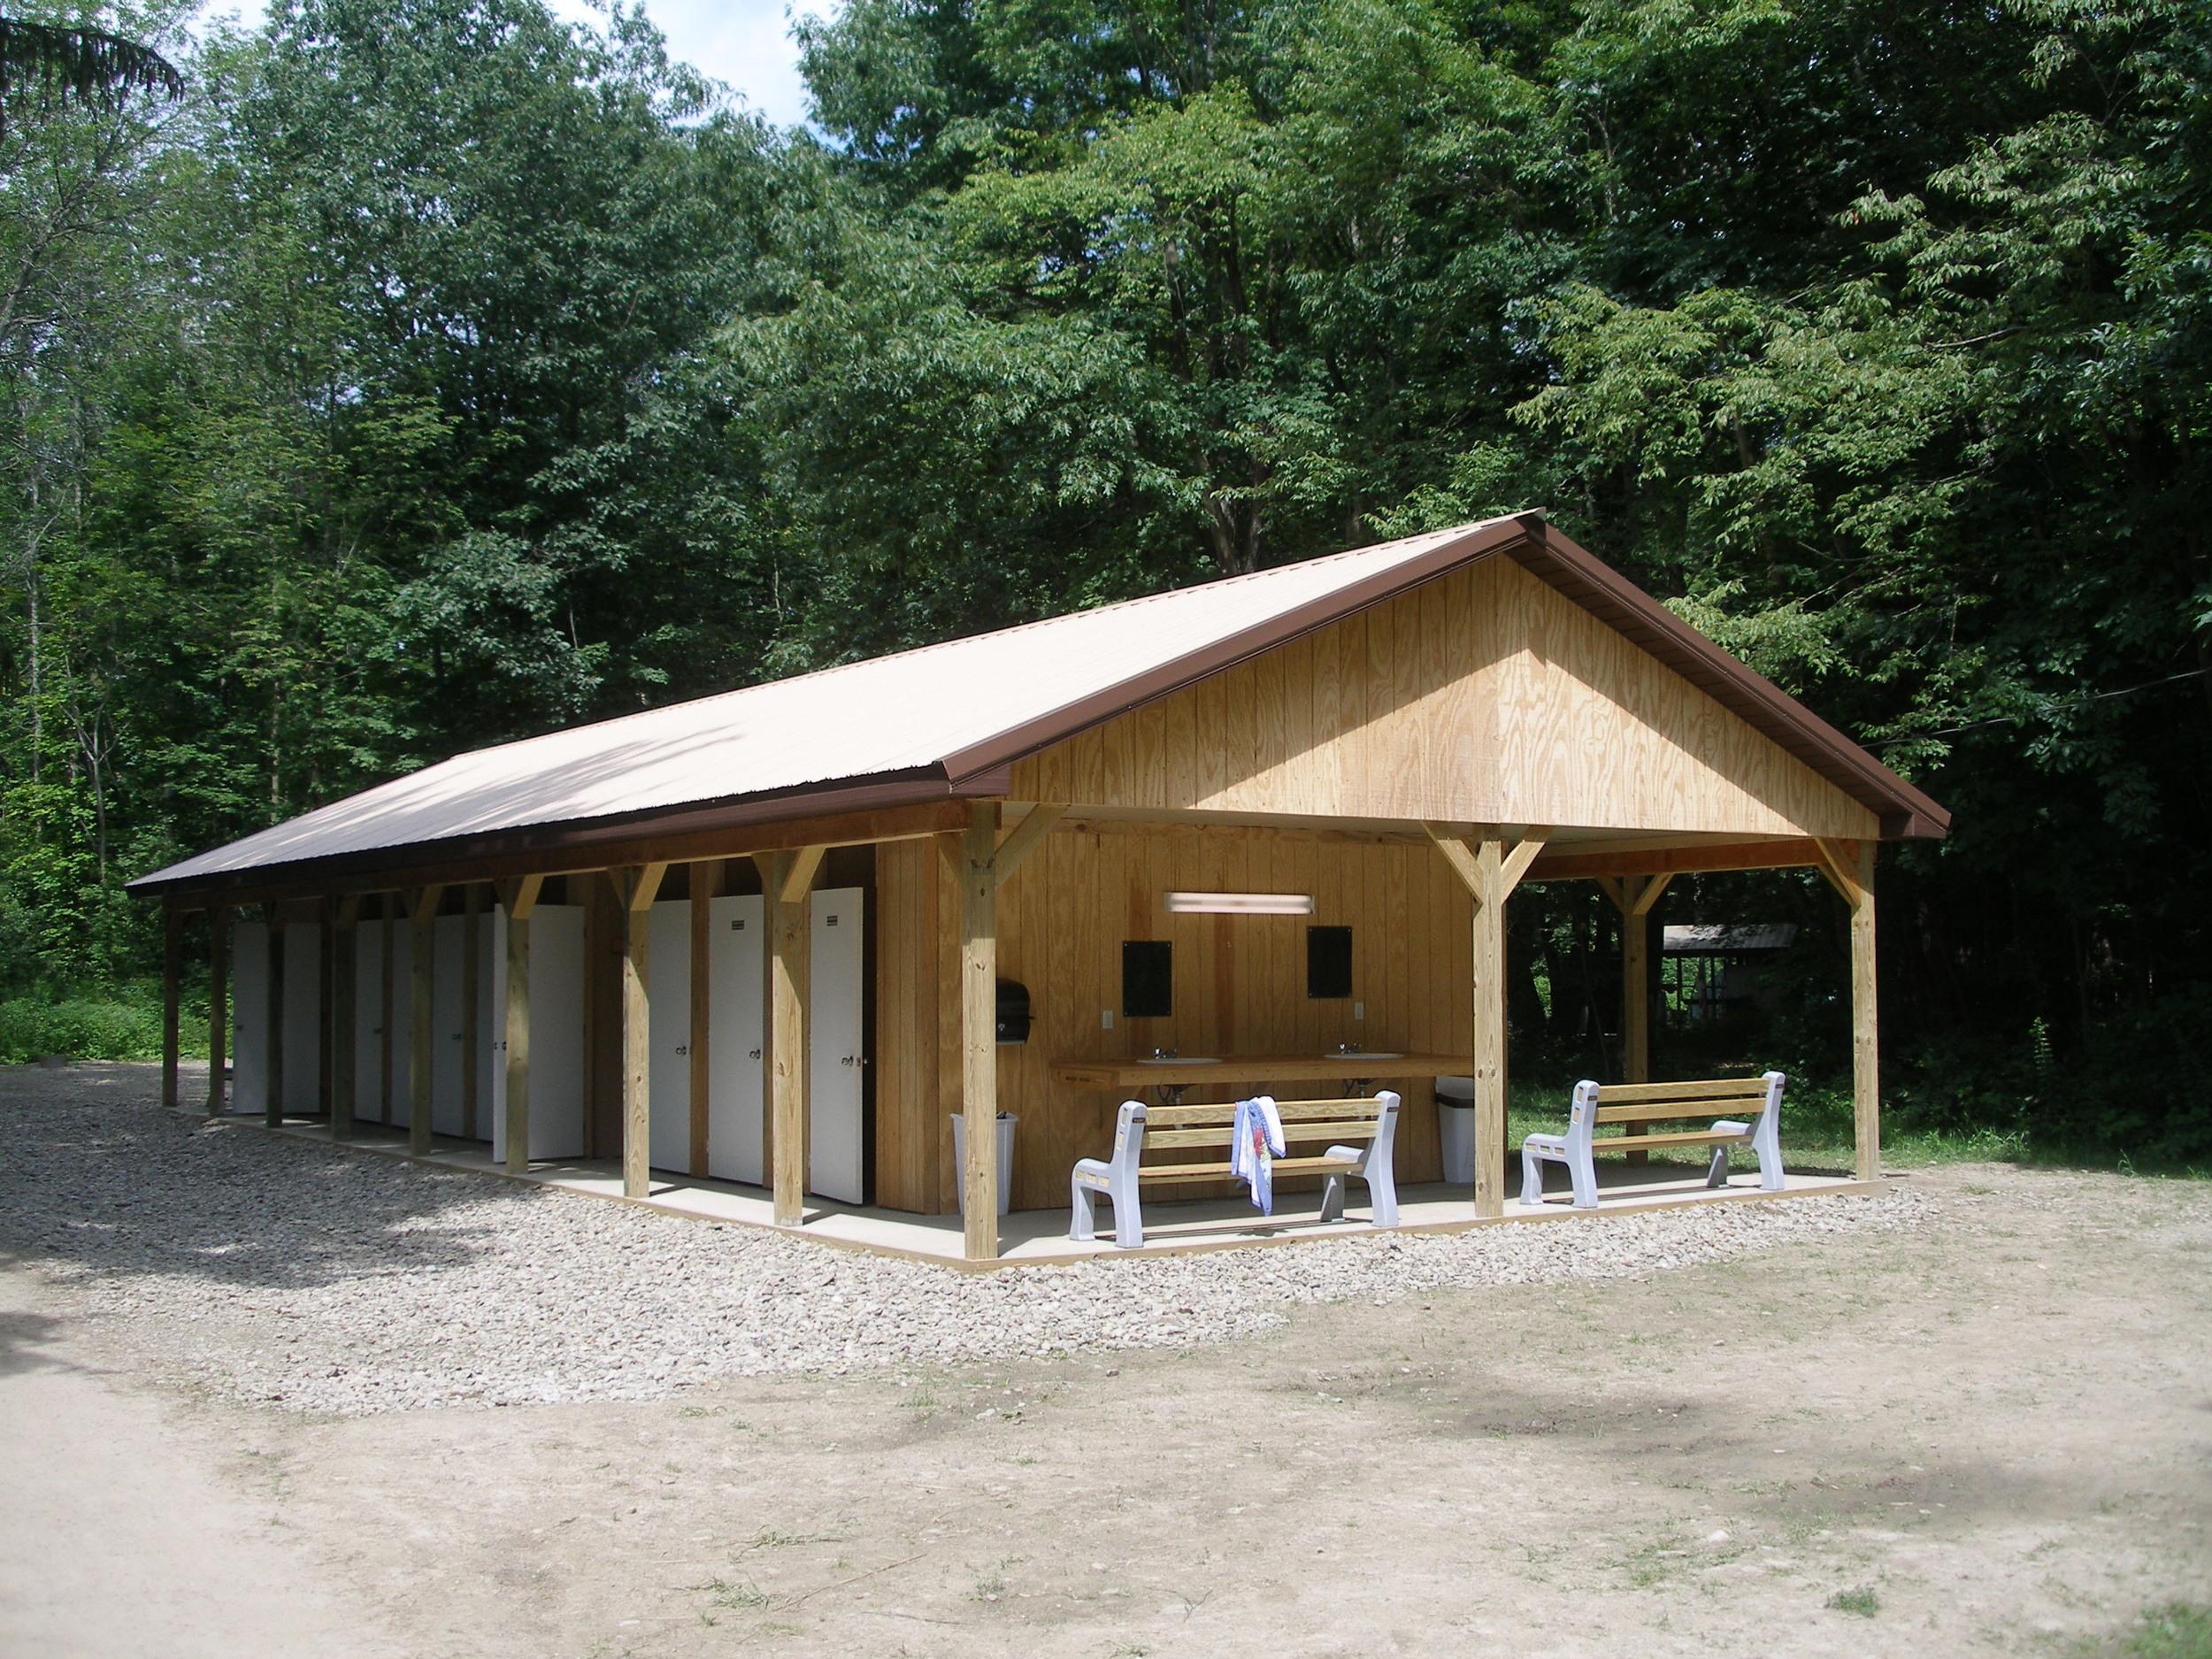 New Shower House Camp Merz 2013.jpg